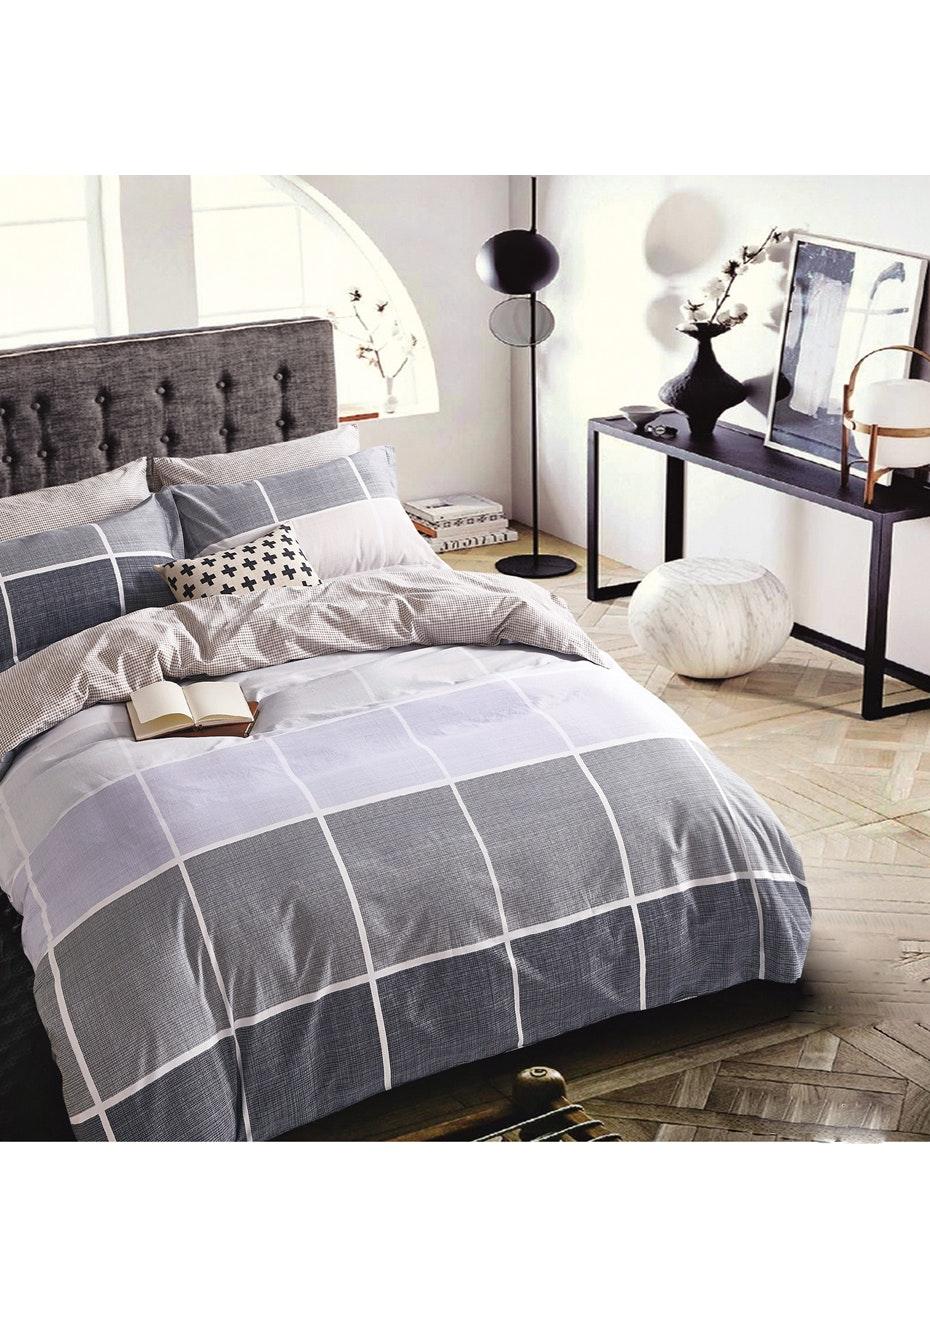 Catalina Quilt Cover Set - Reversible Design - 100% Cotton Double Bed